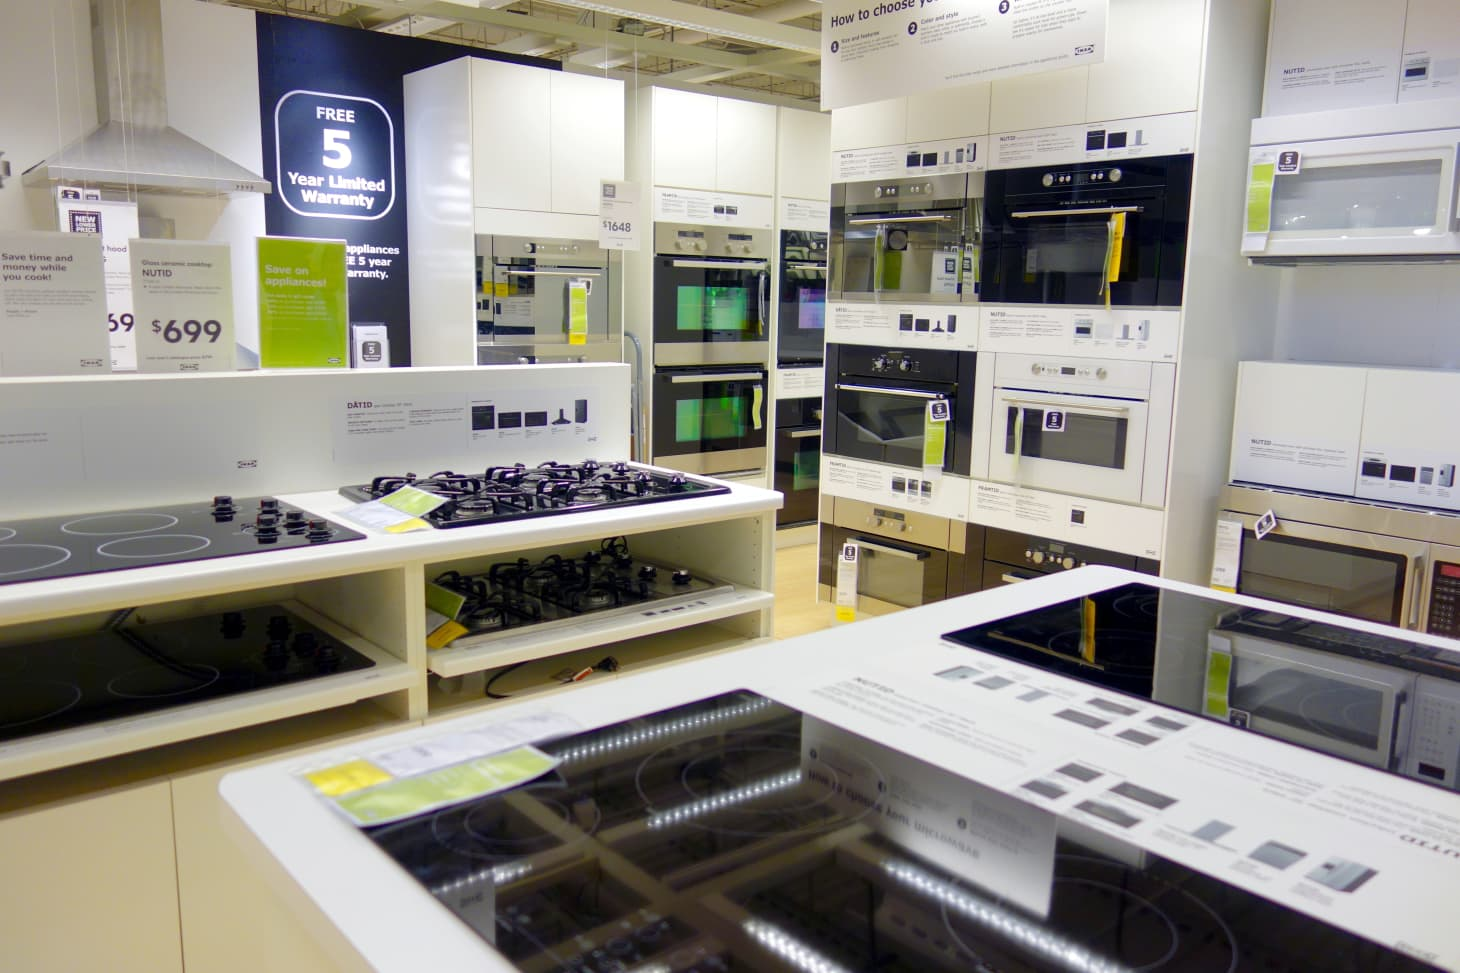 IKEA Kitchen Sale 2018 - Secret Shopping Tips | Apartment